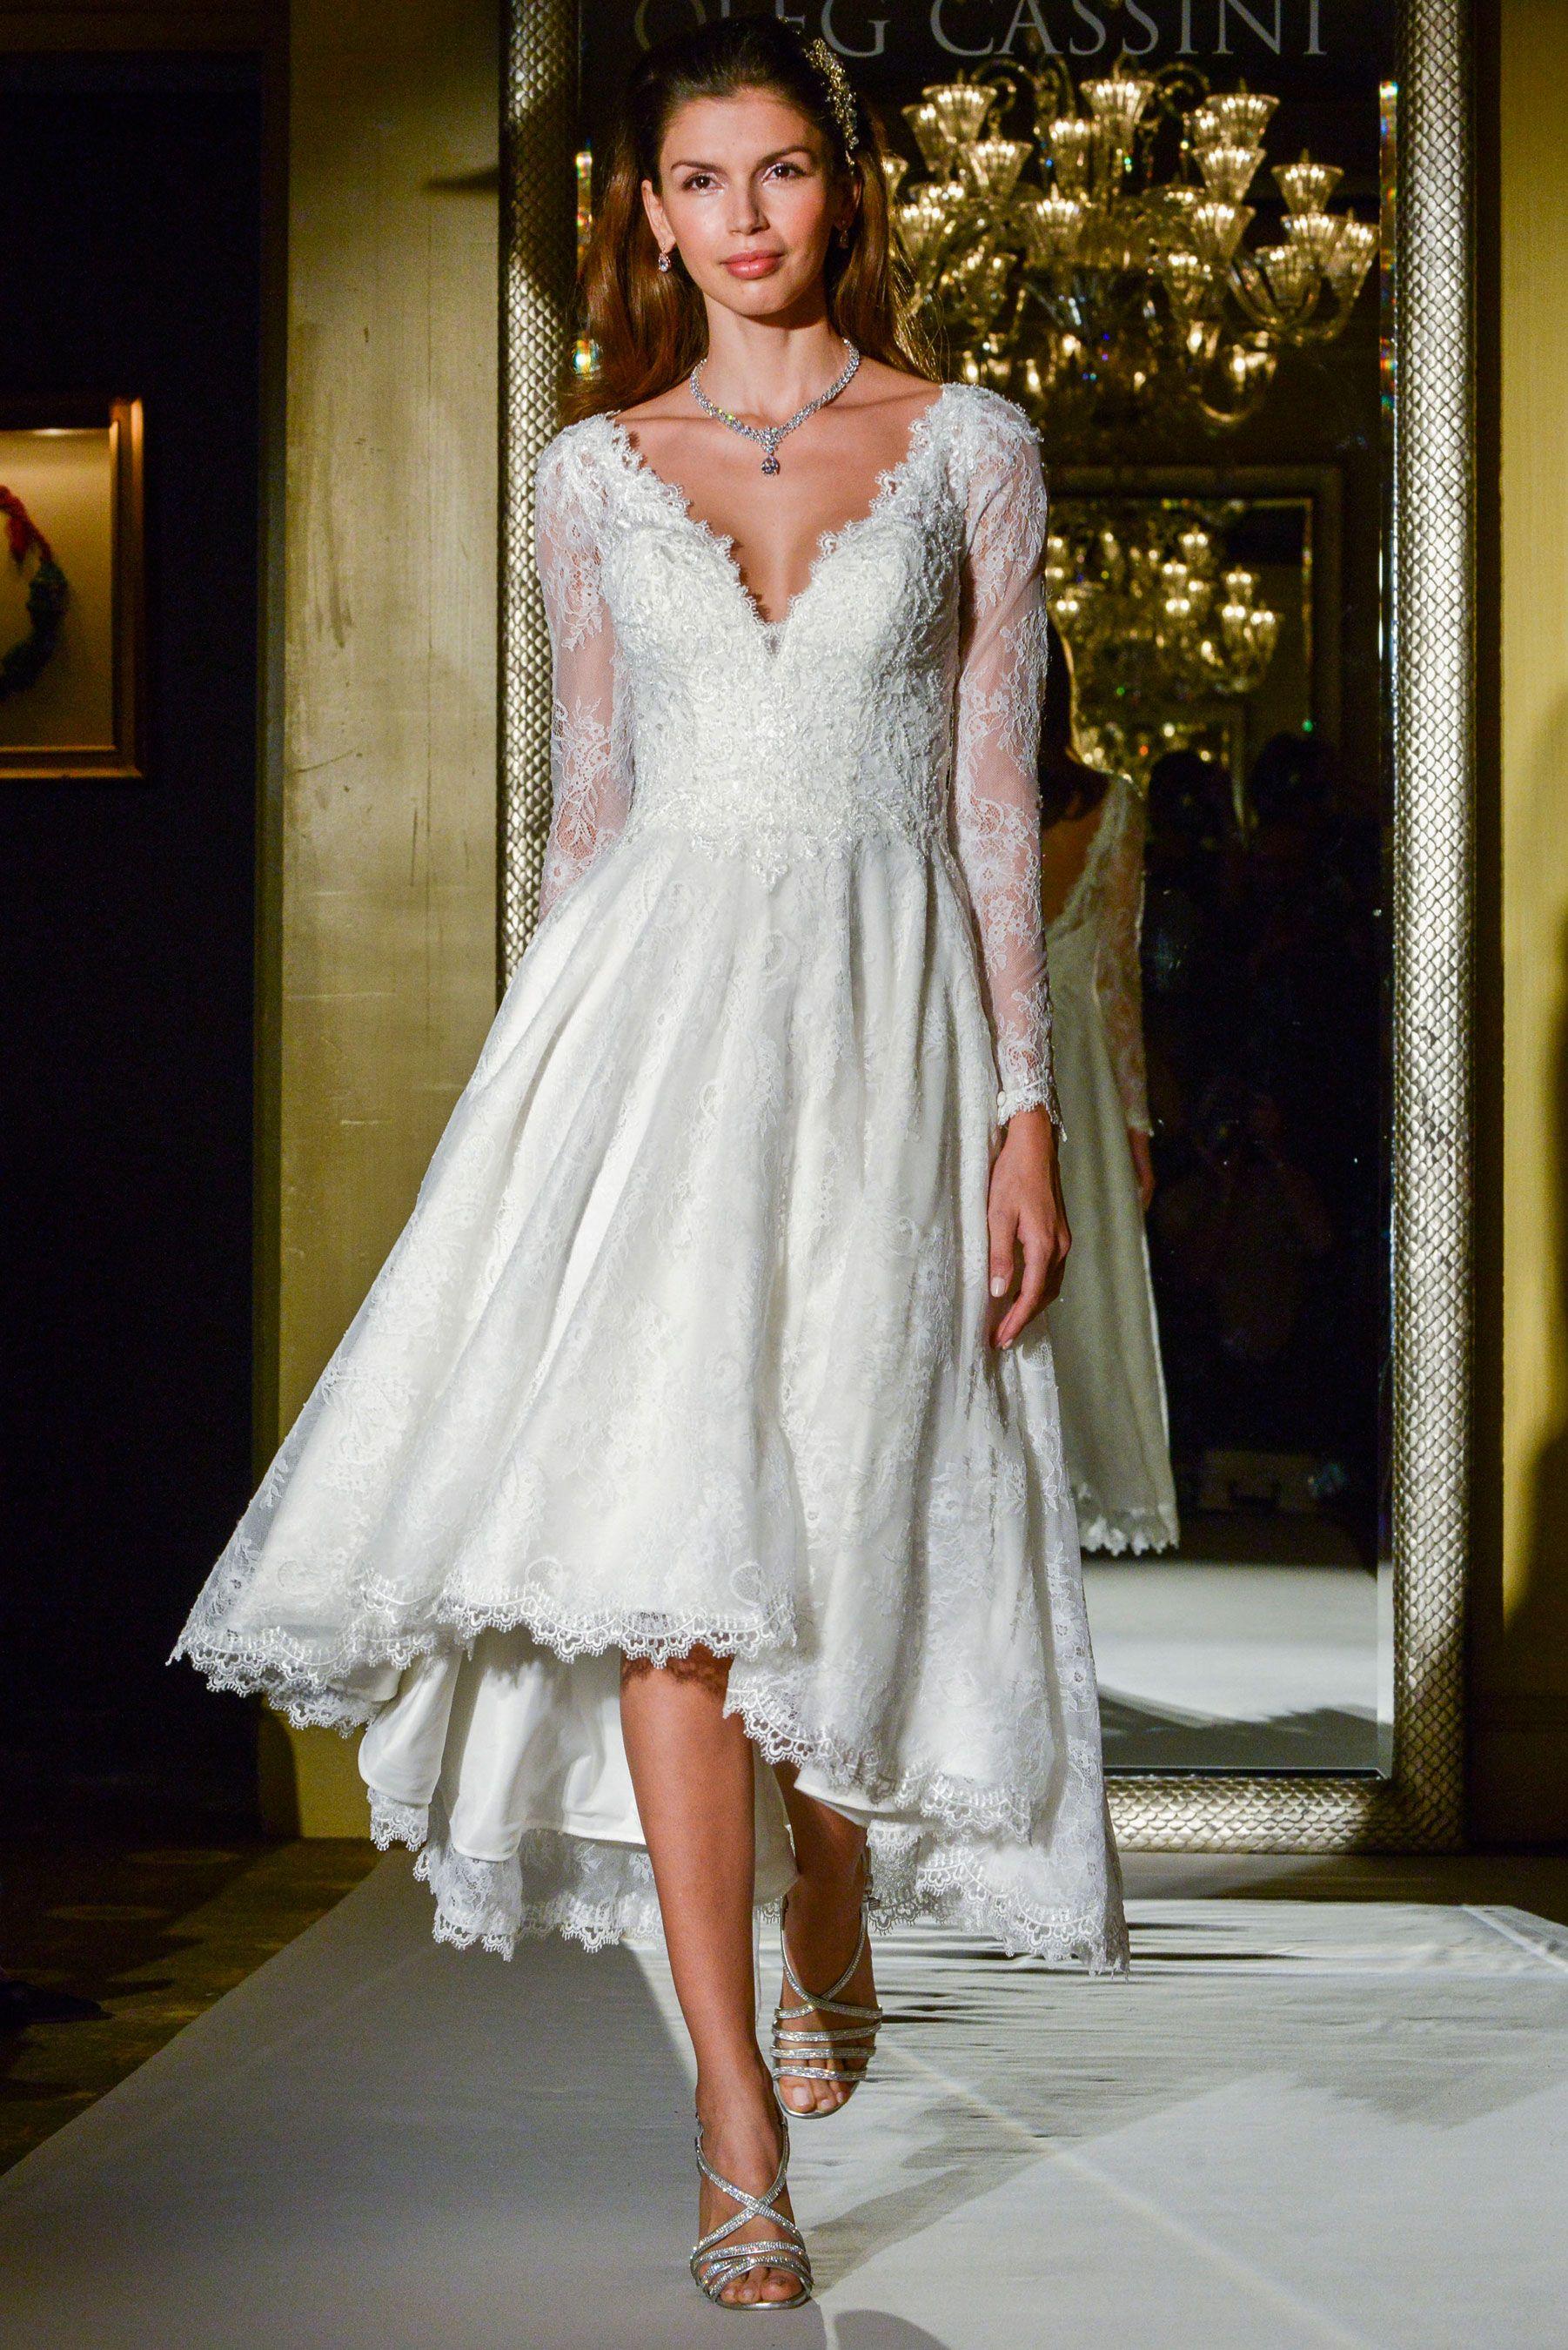 Carolyn Bessette Kennedy Wedding Dress Copy - The Best Wedding 2018